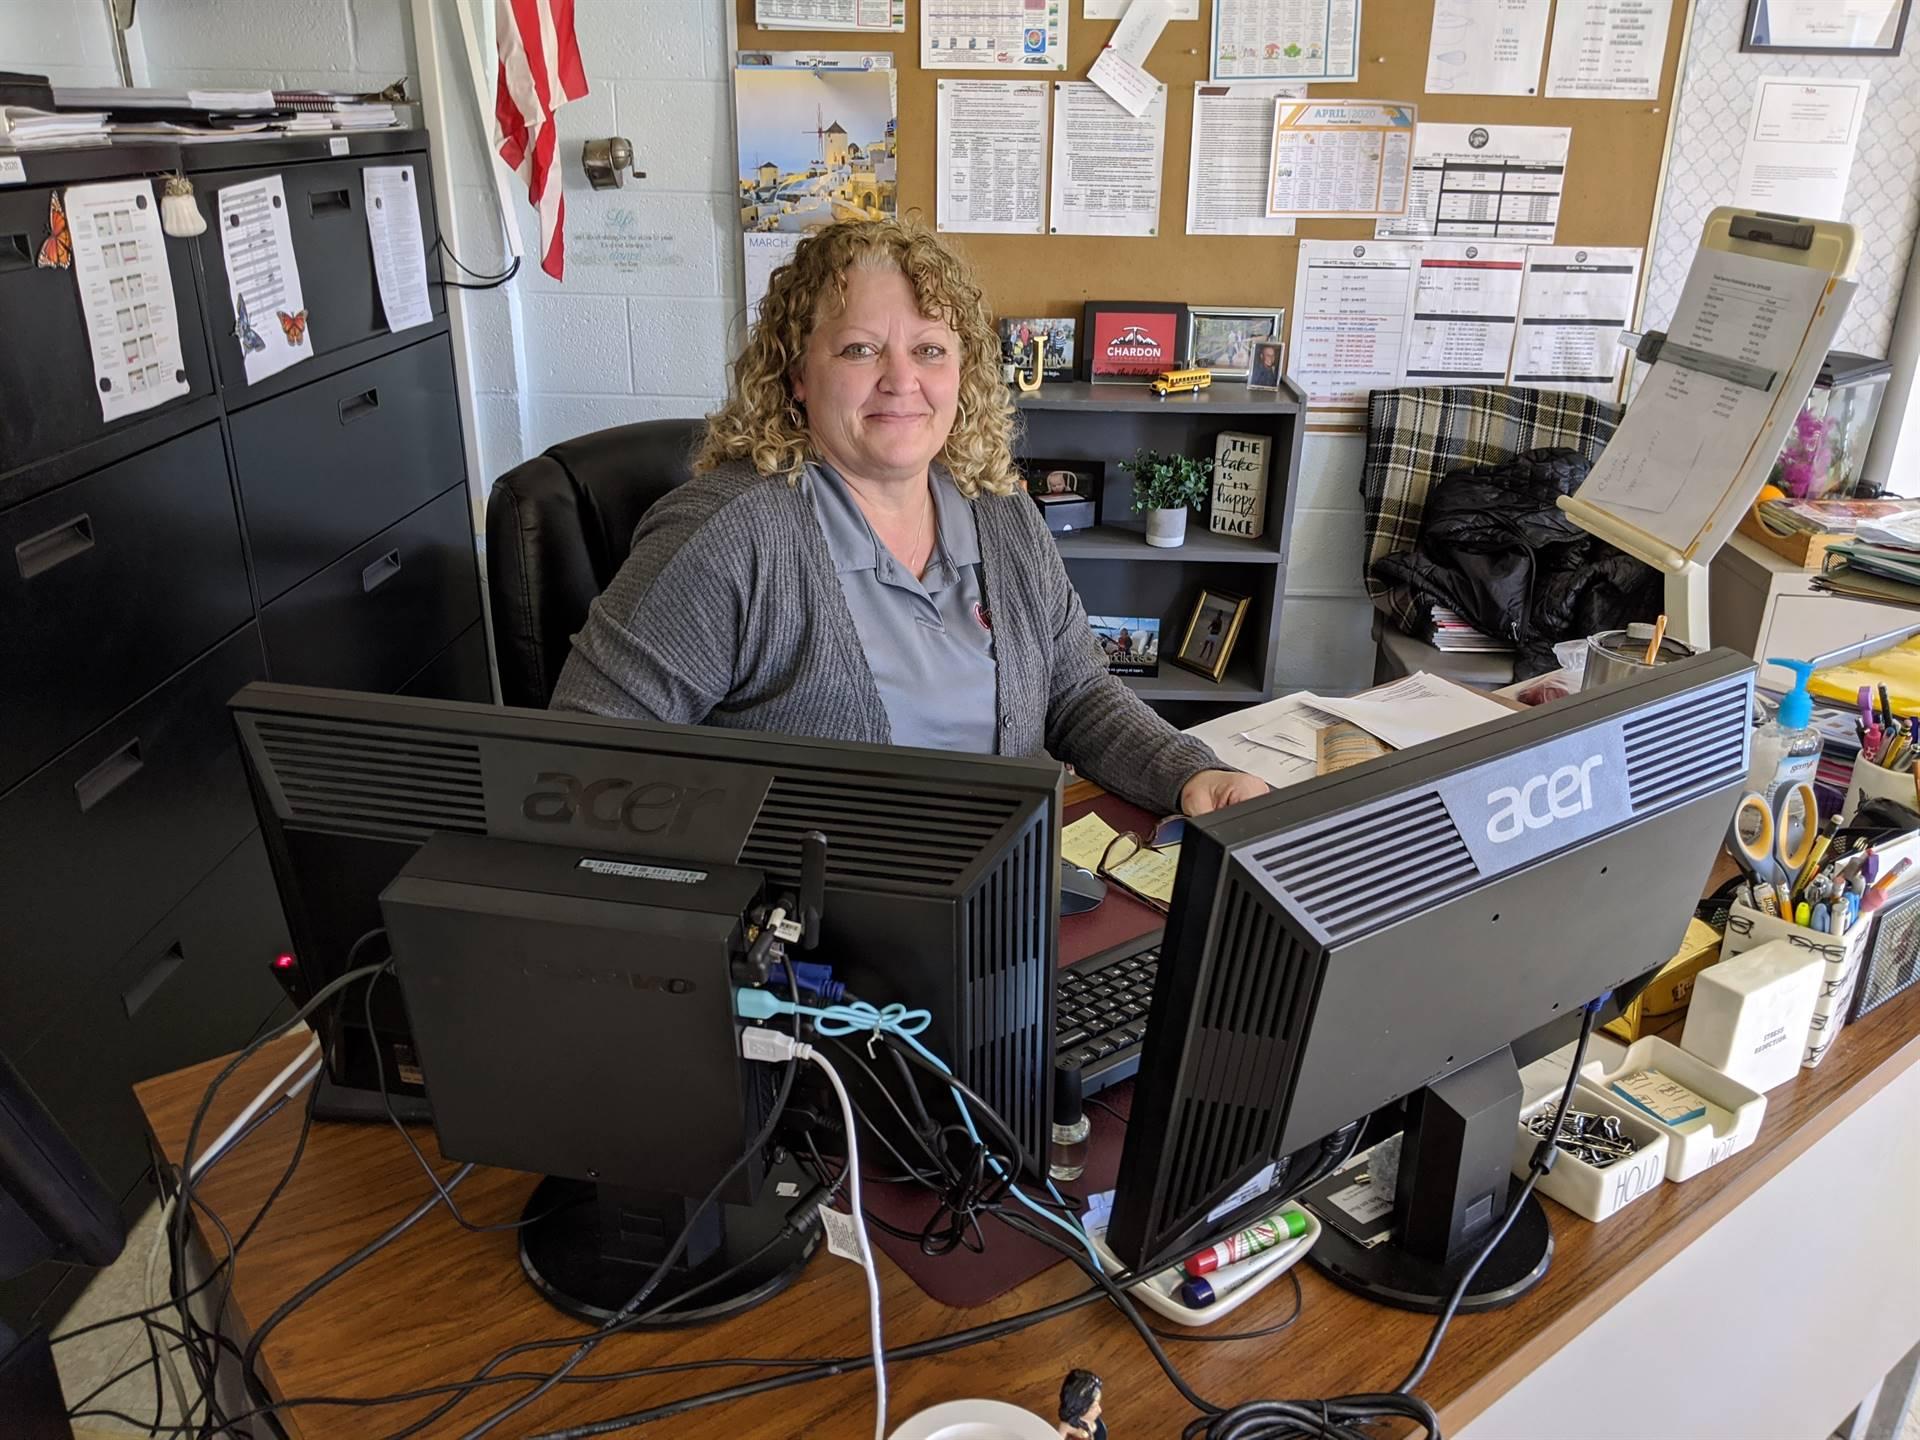 Food Services Director Josi Culliton